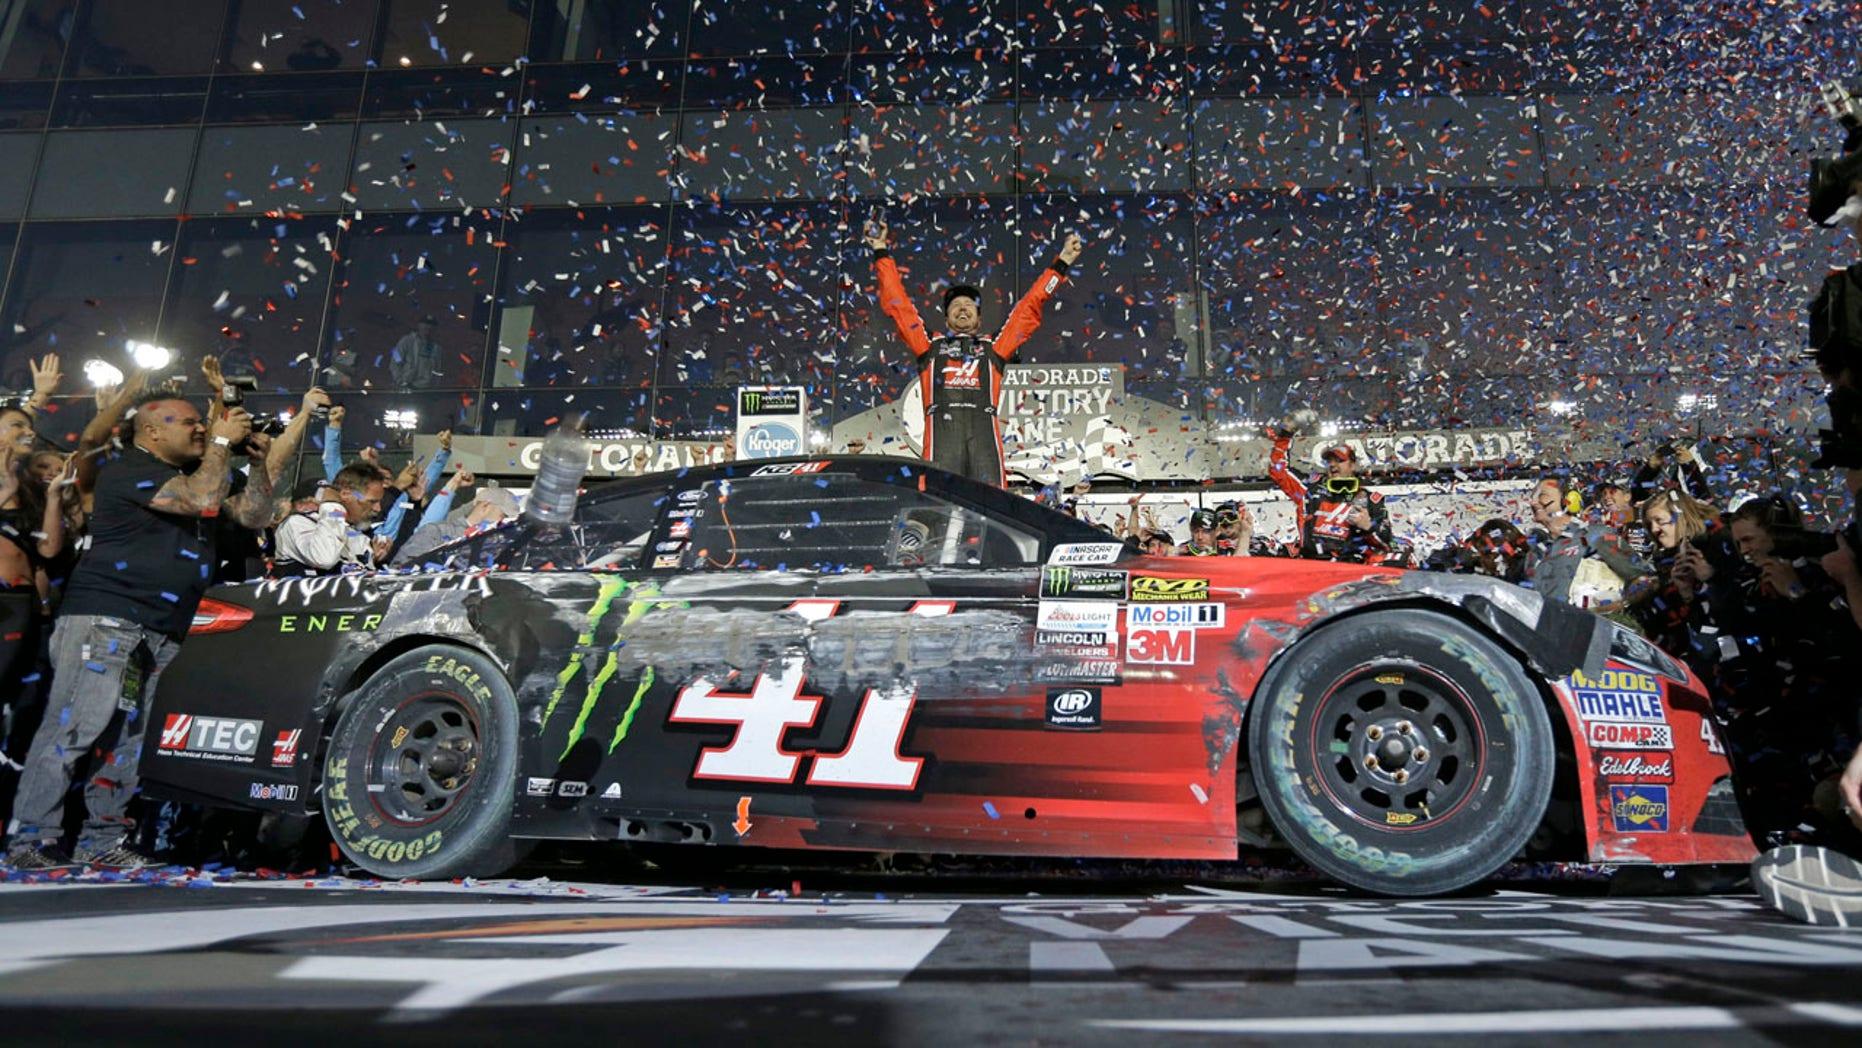 Feb. 26, 2017: Kurt Busch celebrates in Victory Lane after winning the Daytona 500.